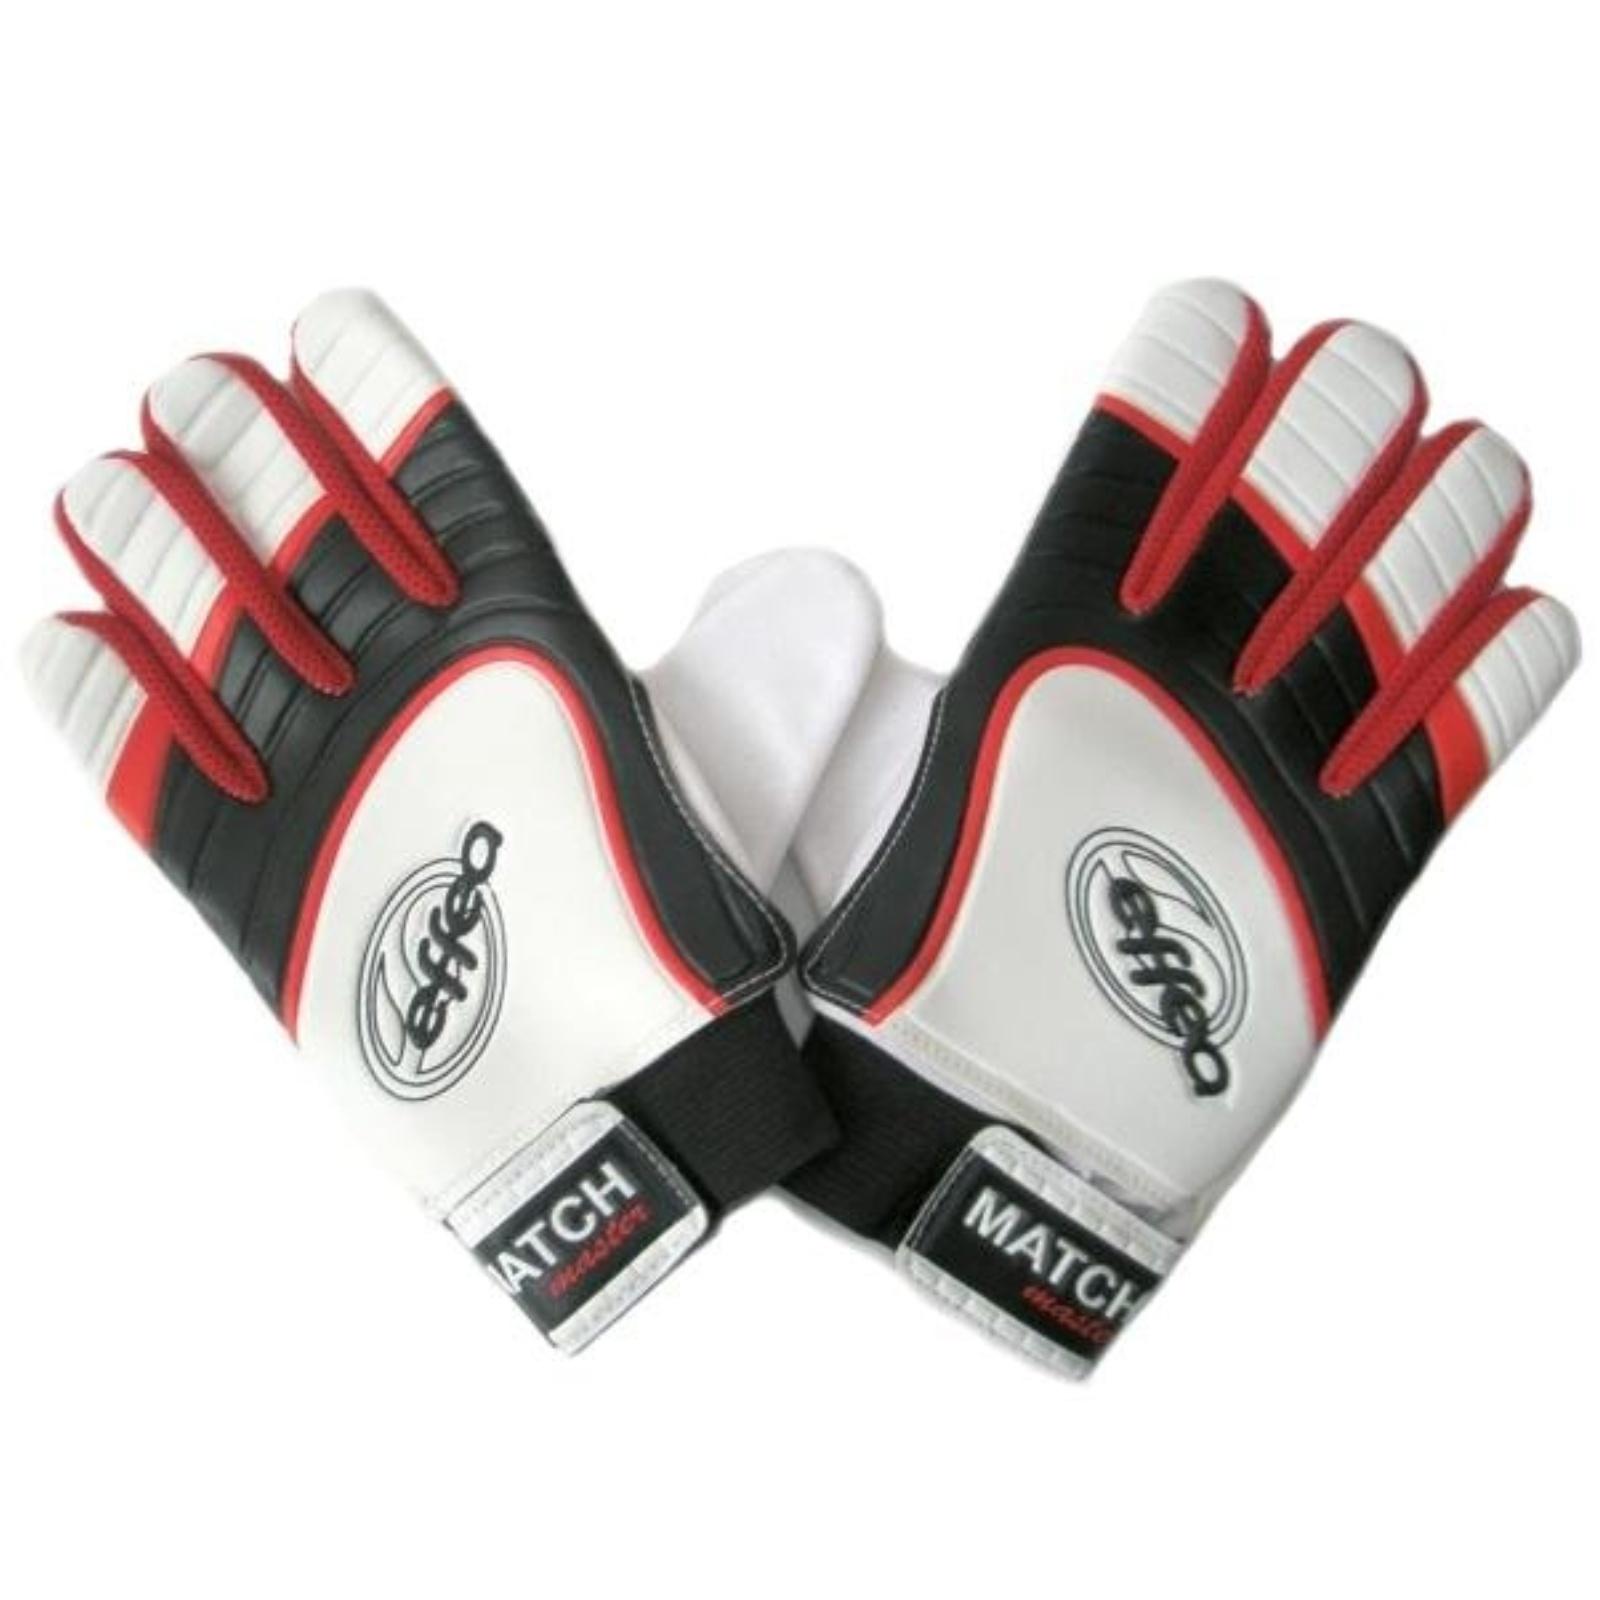 Futbalové rukavice EFFEA 6019 detské - veľ. 9